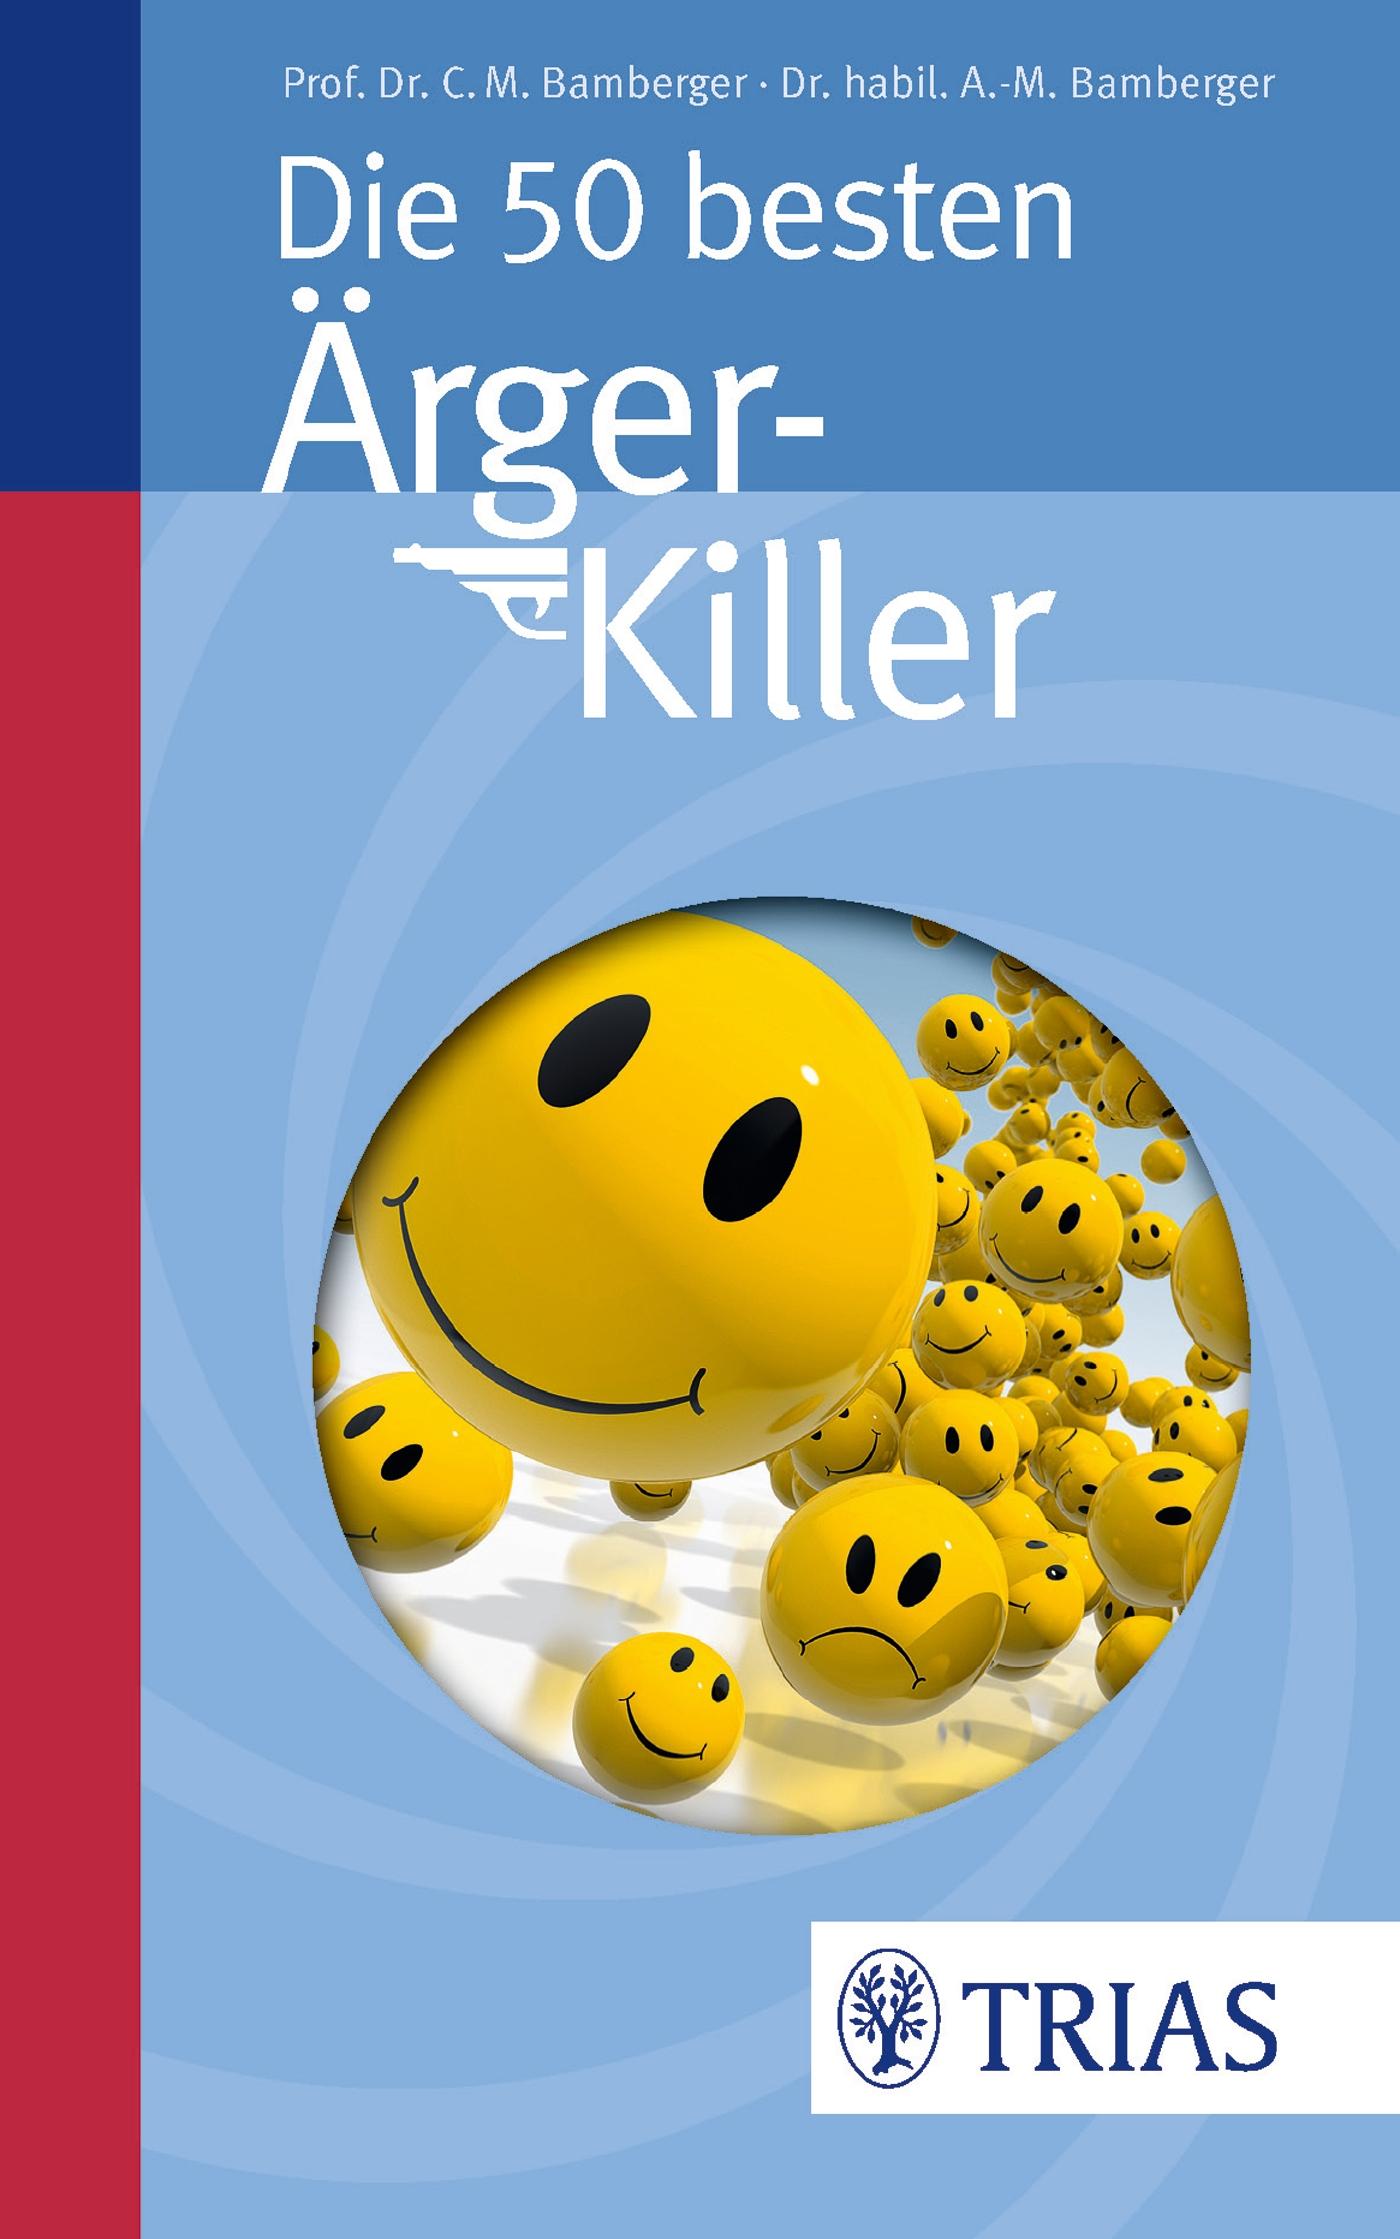 Die 50 besten Ärger-Killer